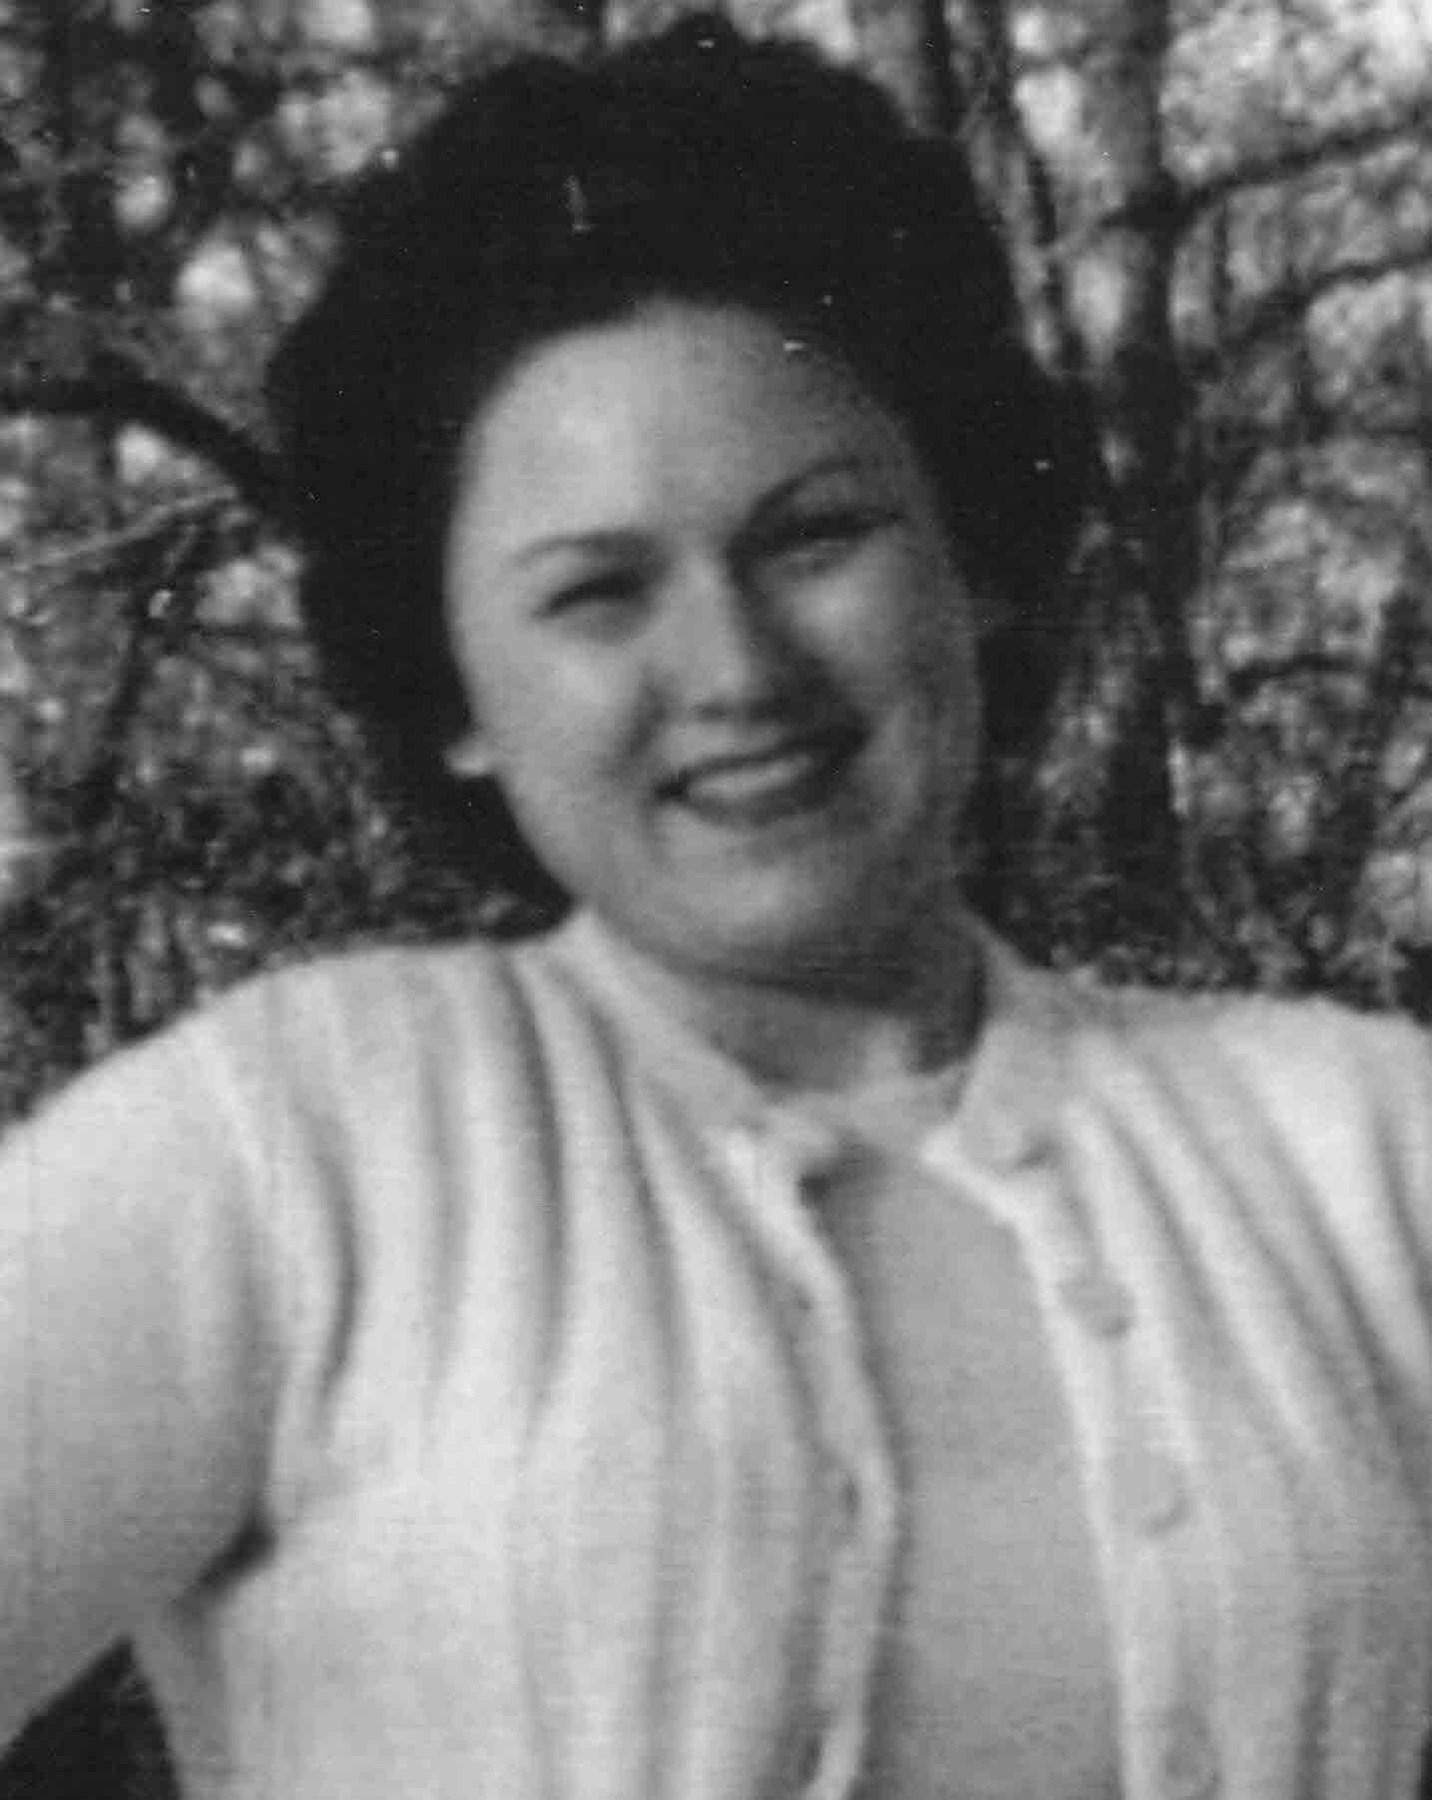 Shenaz Treasurywala,Peggy Ahern XXX video Maria Isabel Lopez (b. 1957),Jammes Luckett